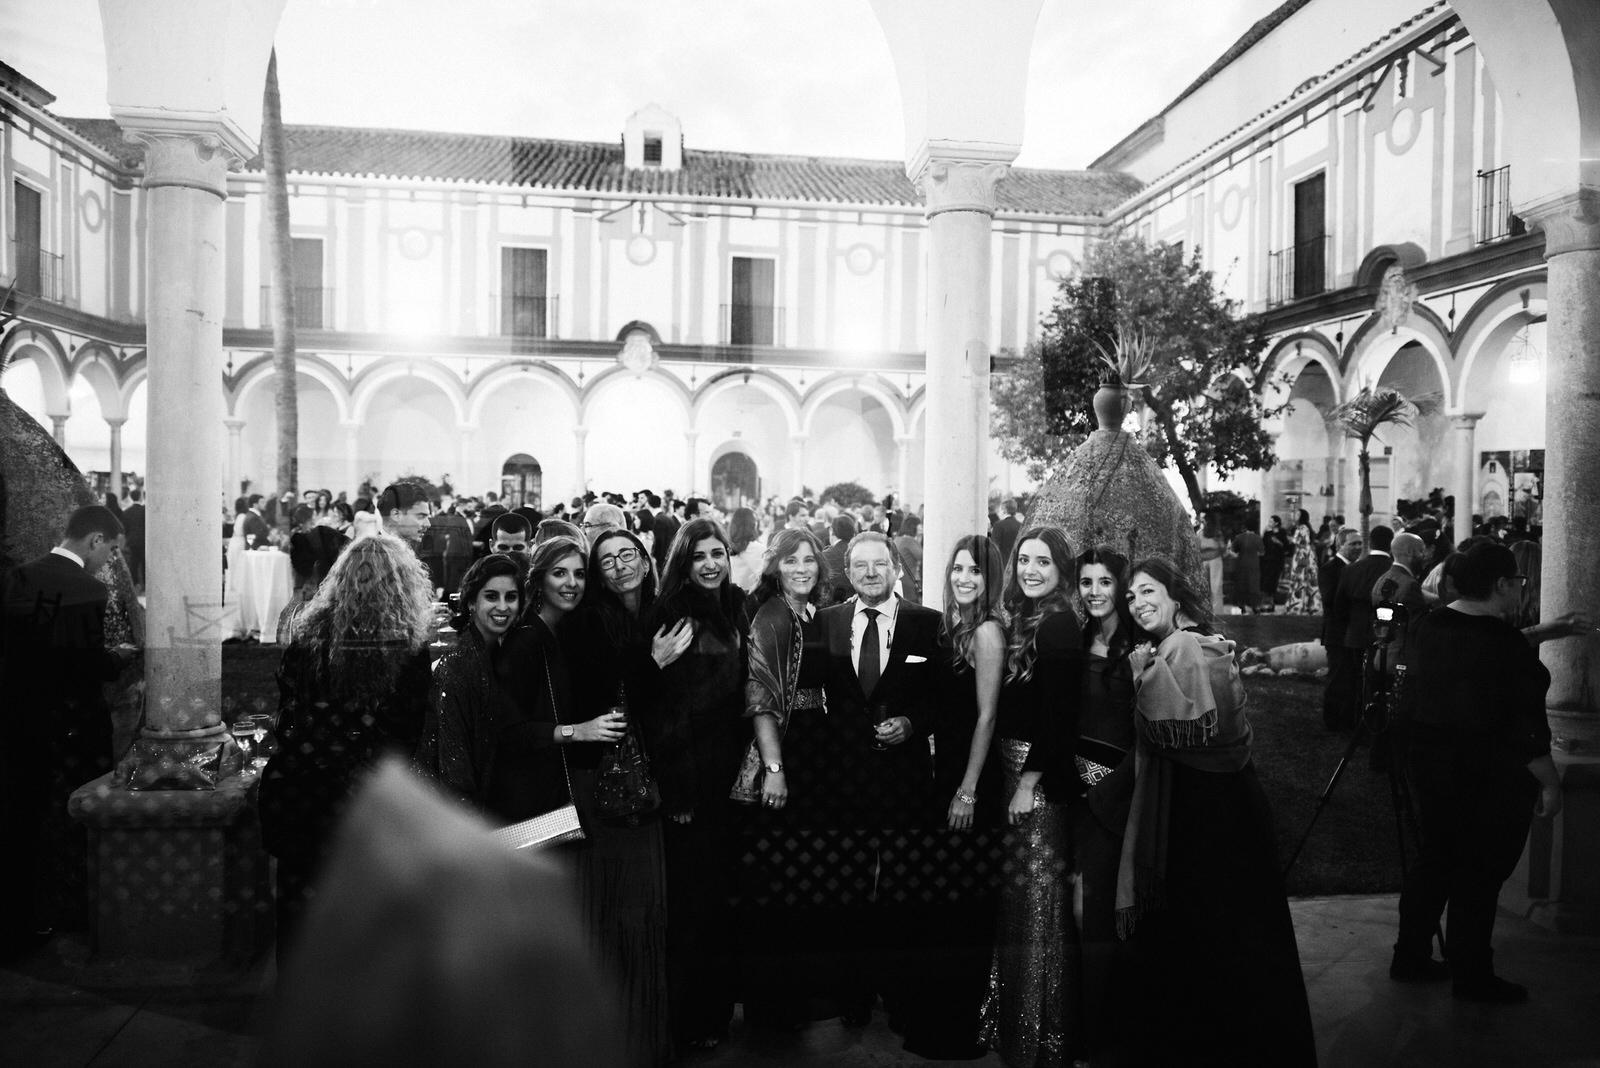 fotografo de bodas sevilla - fotografo boda - fotografía sevilla - Andrés AmarilloAAA_3359-2- fine.JPG